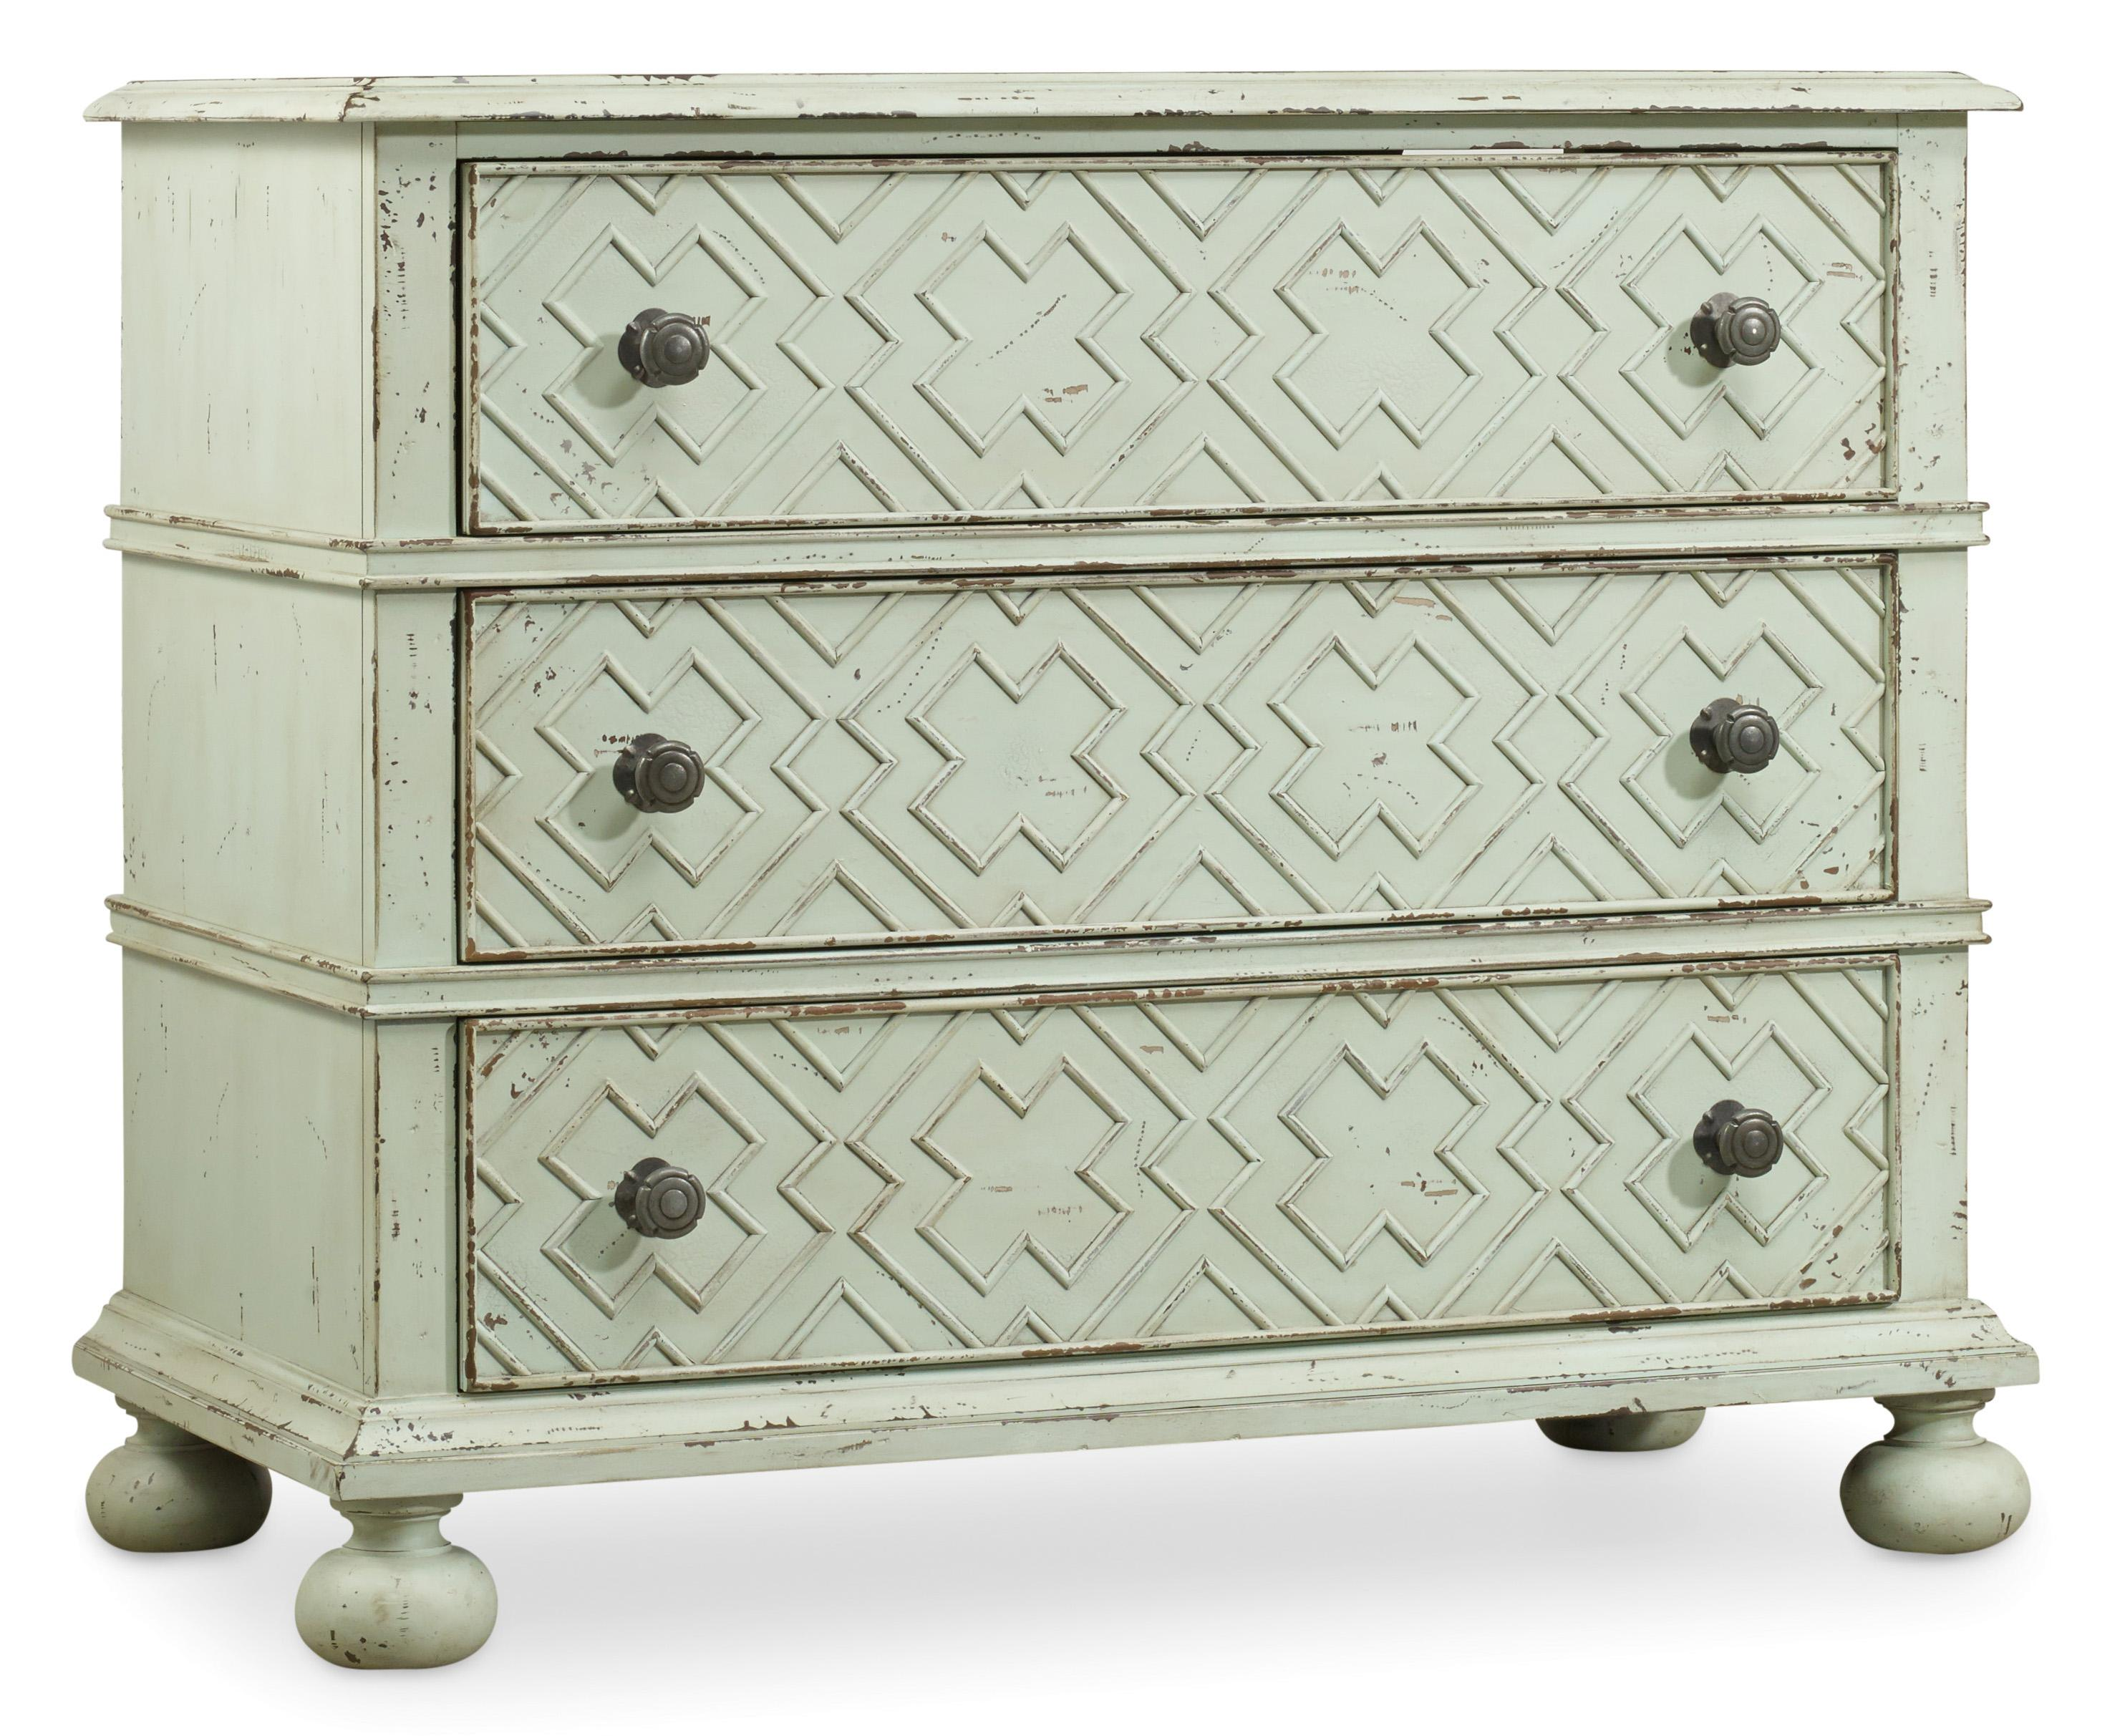 Hooker Furniture Sunset Point 3 Drawer Bachelor's Chest - Item Number: 5326-90017